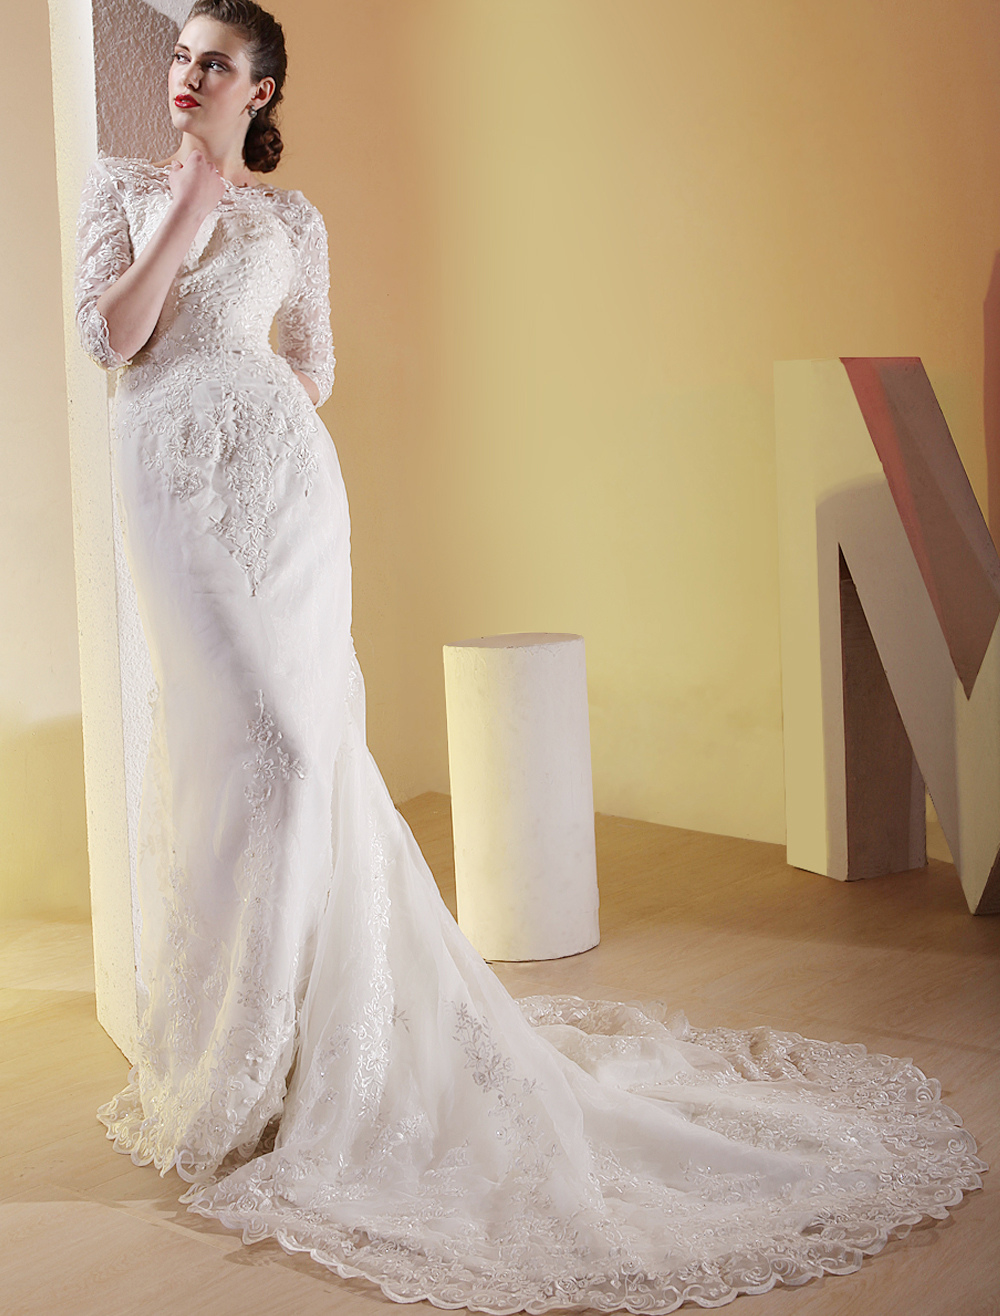 918ead7066a ... White Satin Three Quarter Sleeves Floor Length Luxury Wedding Dress-No.3  ...